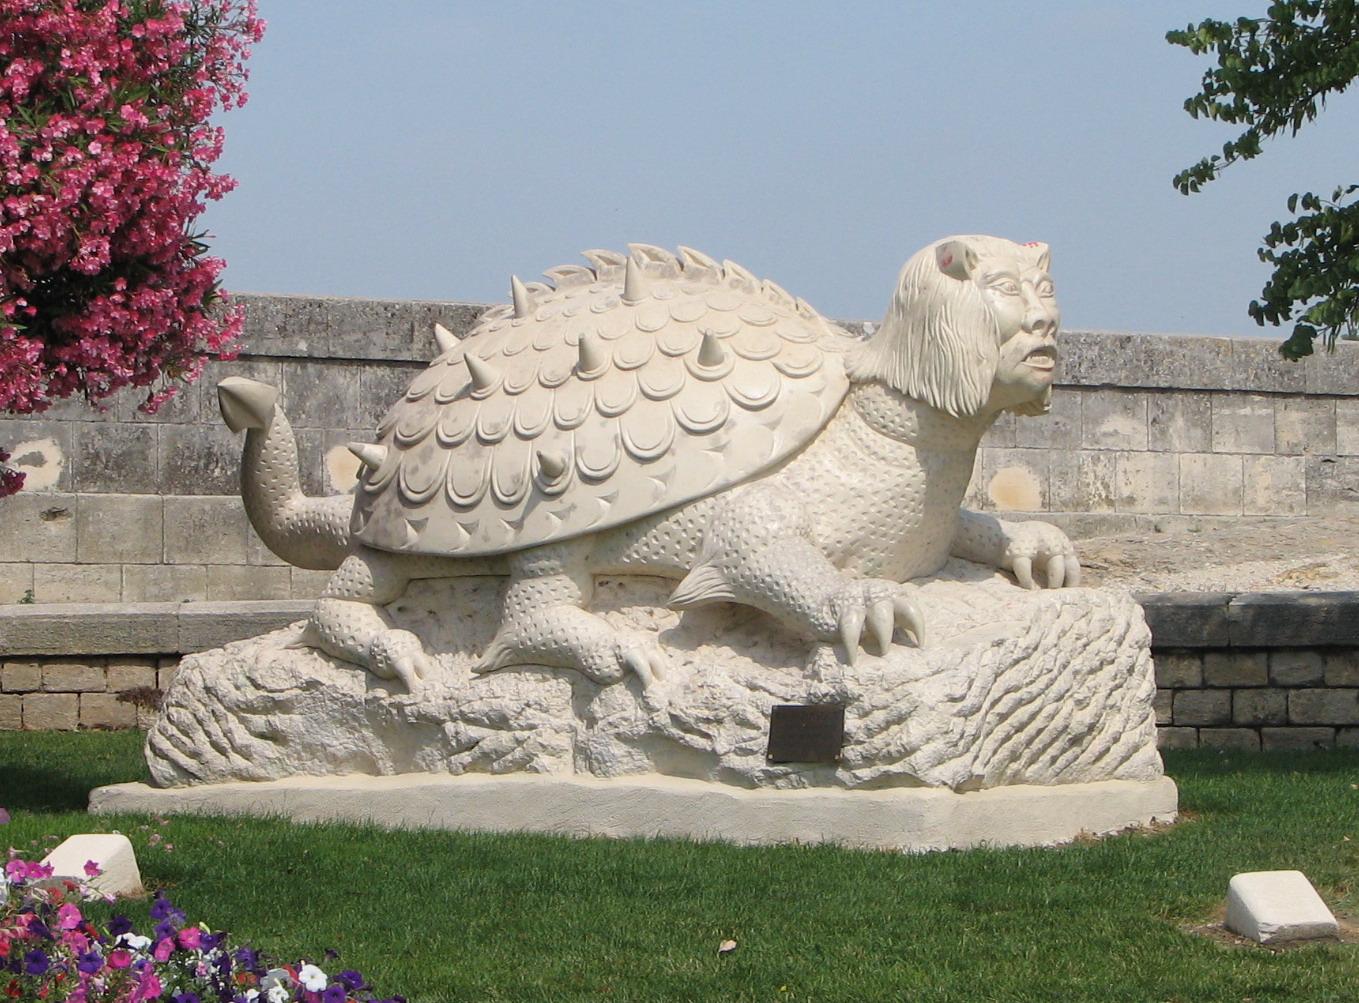 File:TarasqueStatue.jpg - Wikimedia Commons